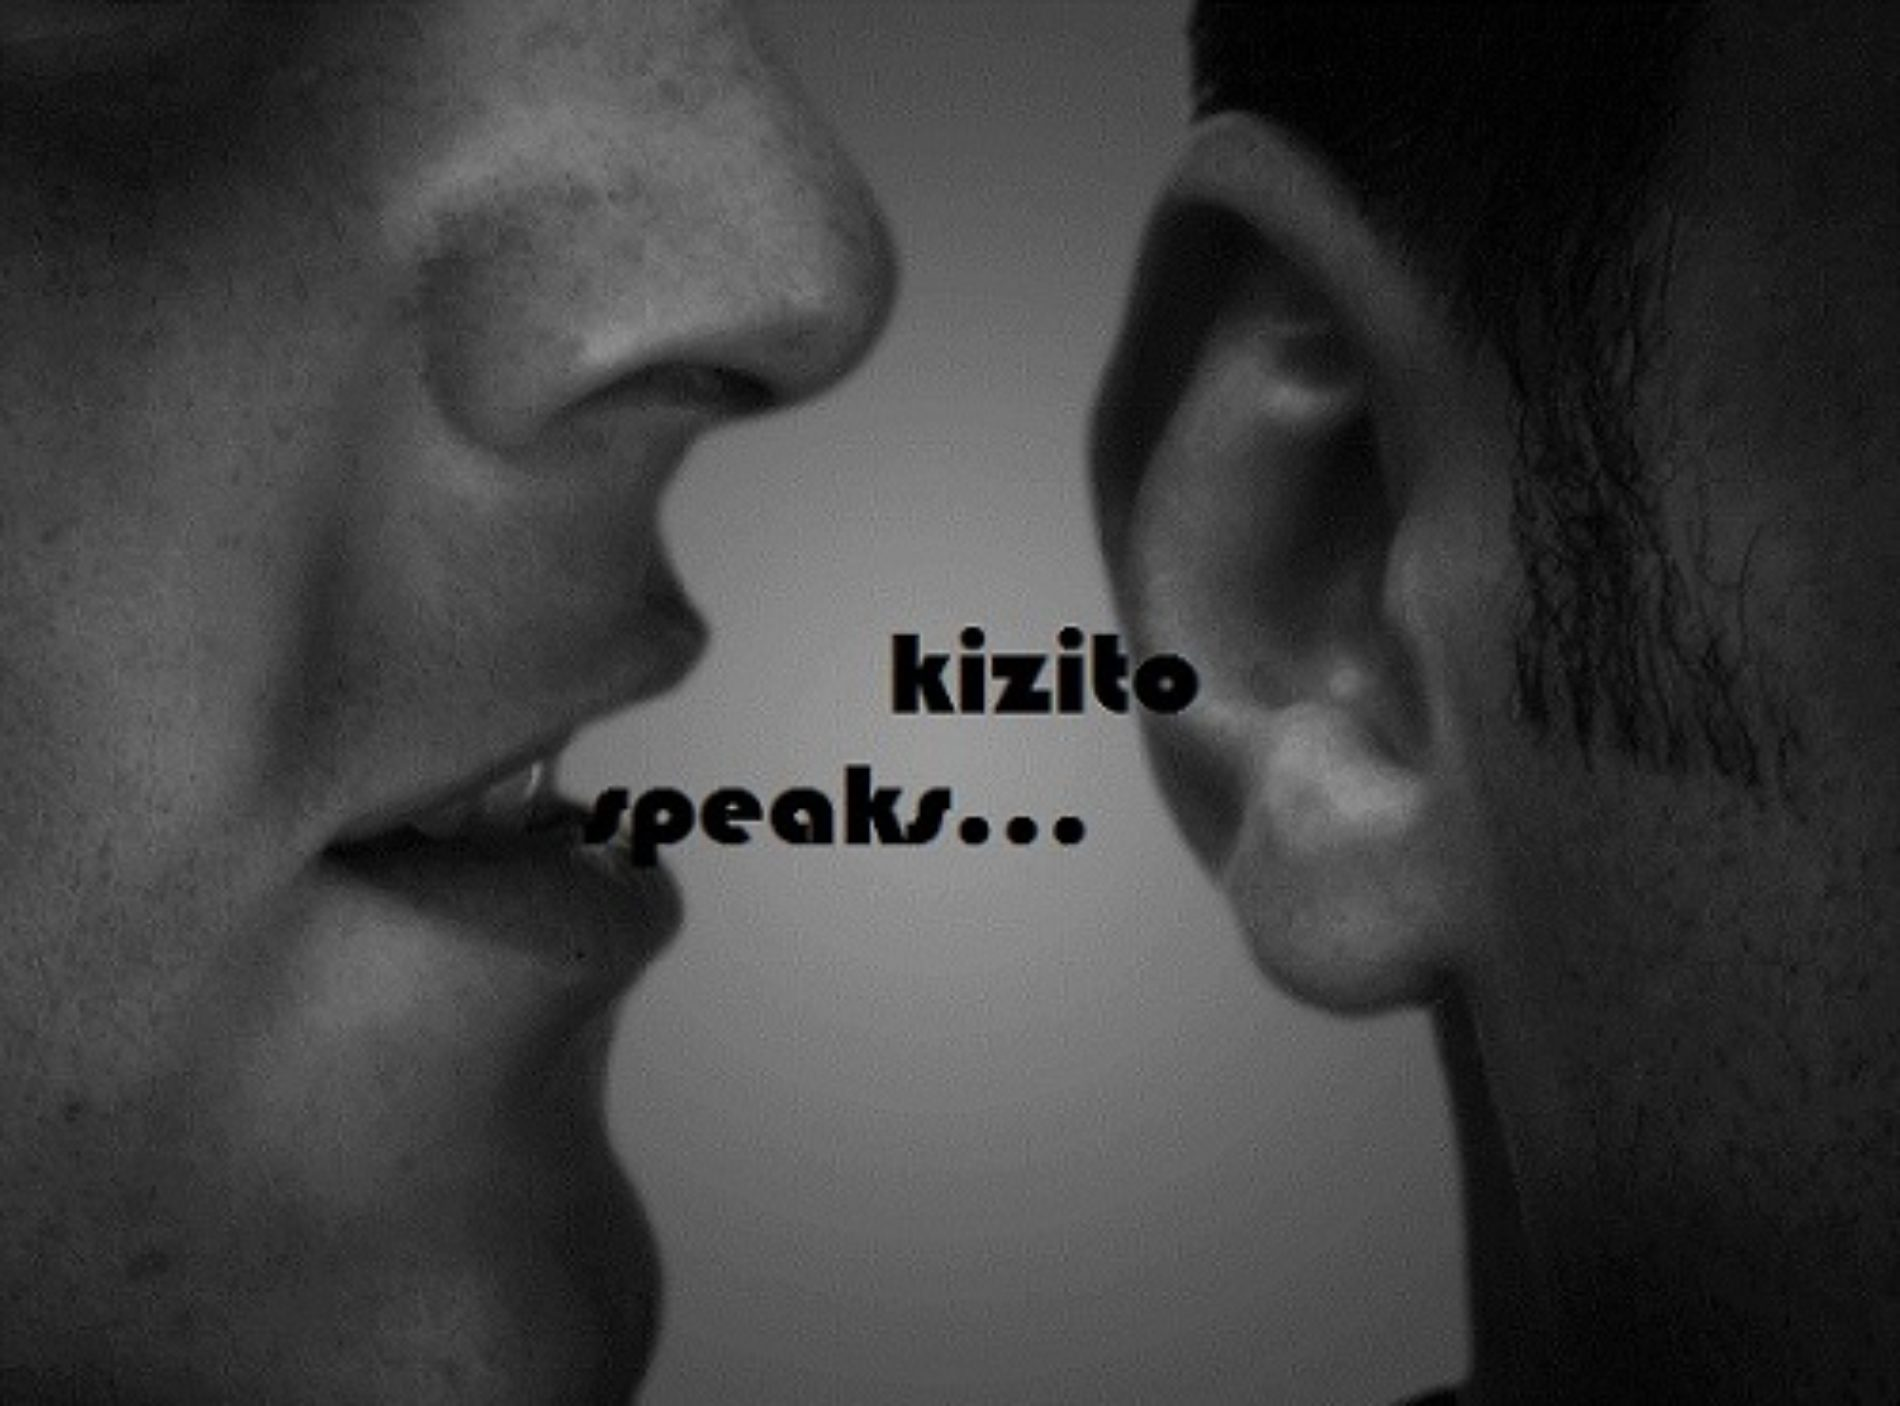 KIZITO SPEAKS XIII